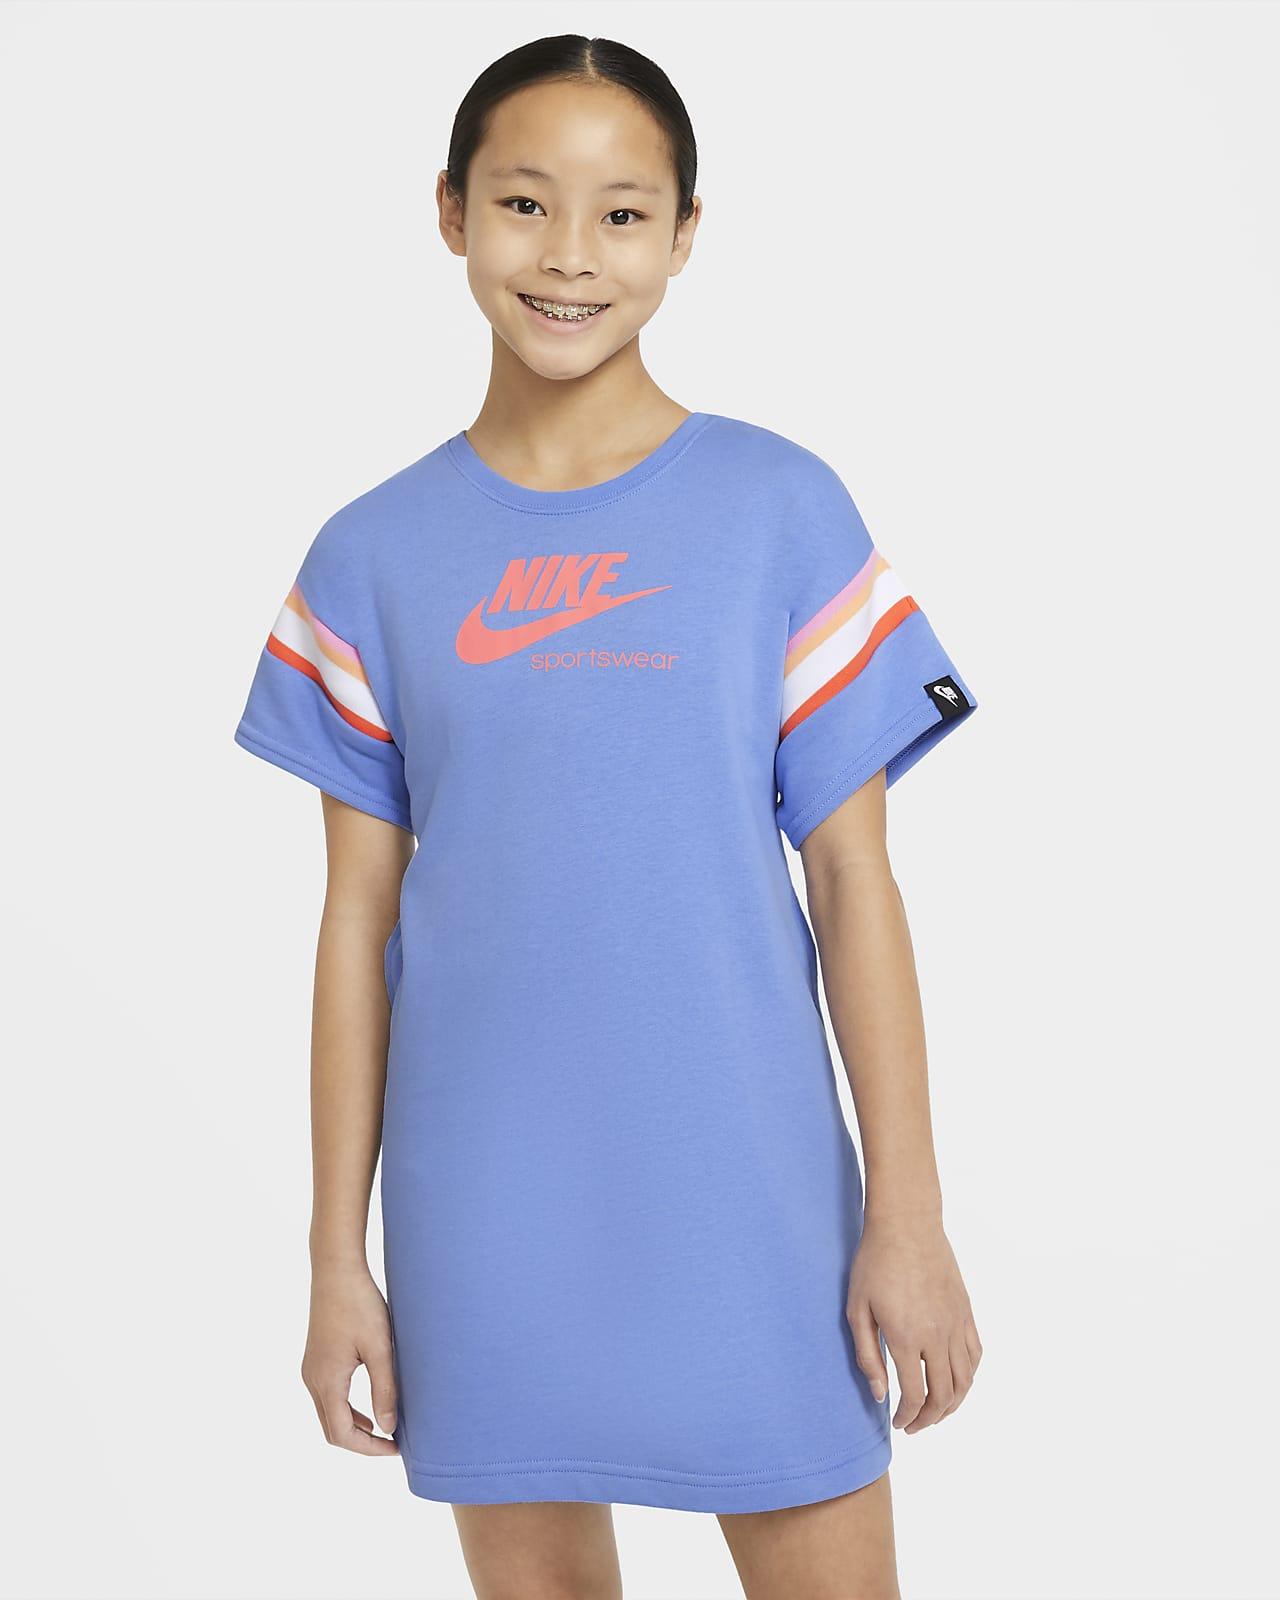 Nike Sportswear Heritage 大童(女孩)短袖连衣裙